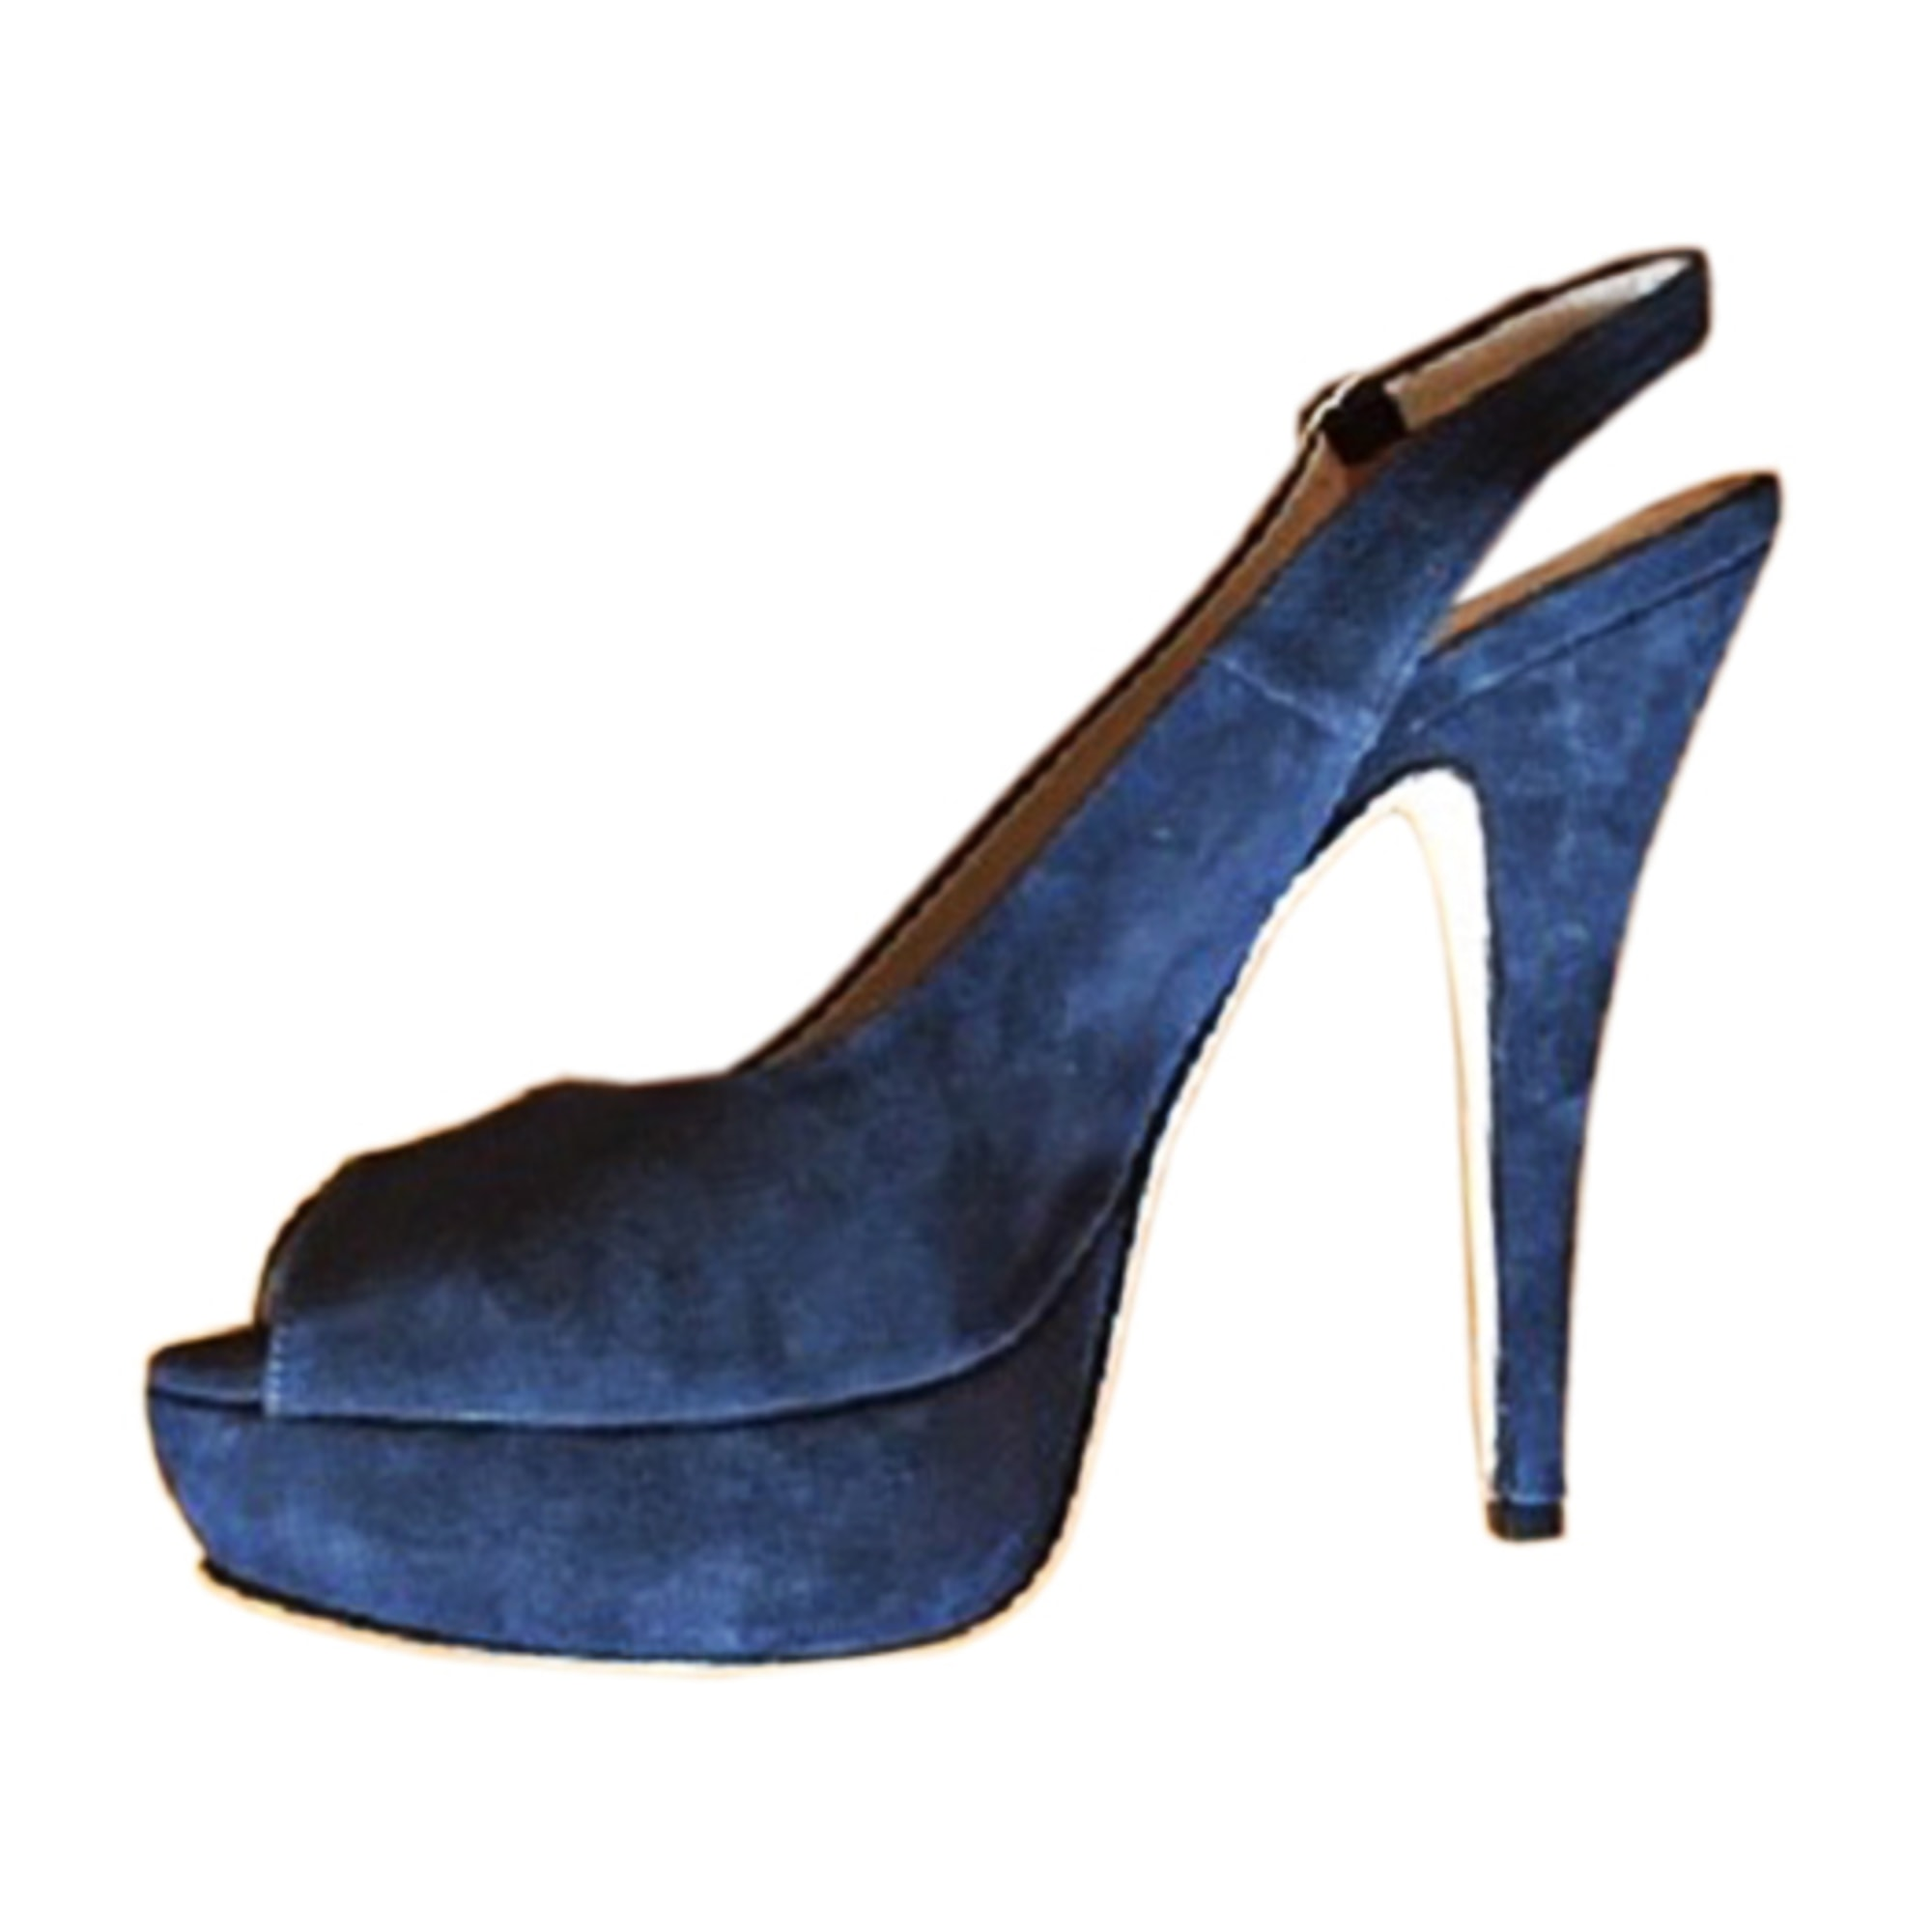 Heeled Sandals CERRUTI 1881 Blue, navy, turquoise